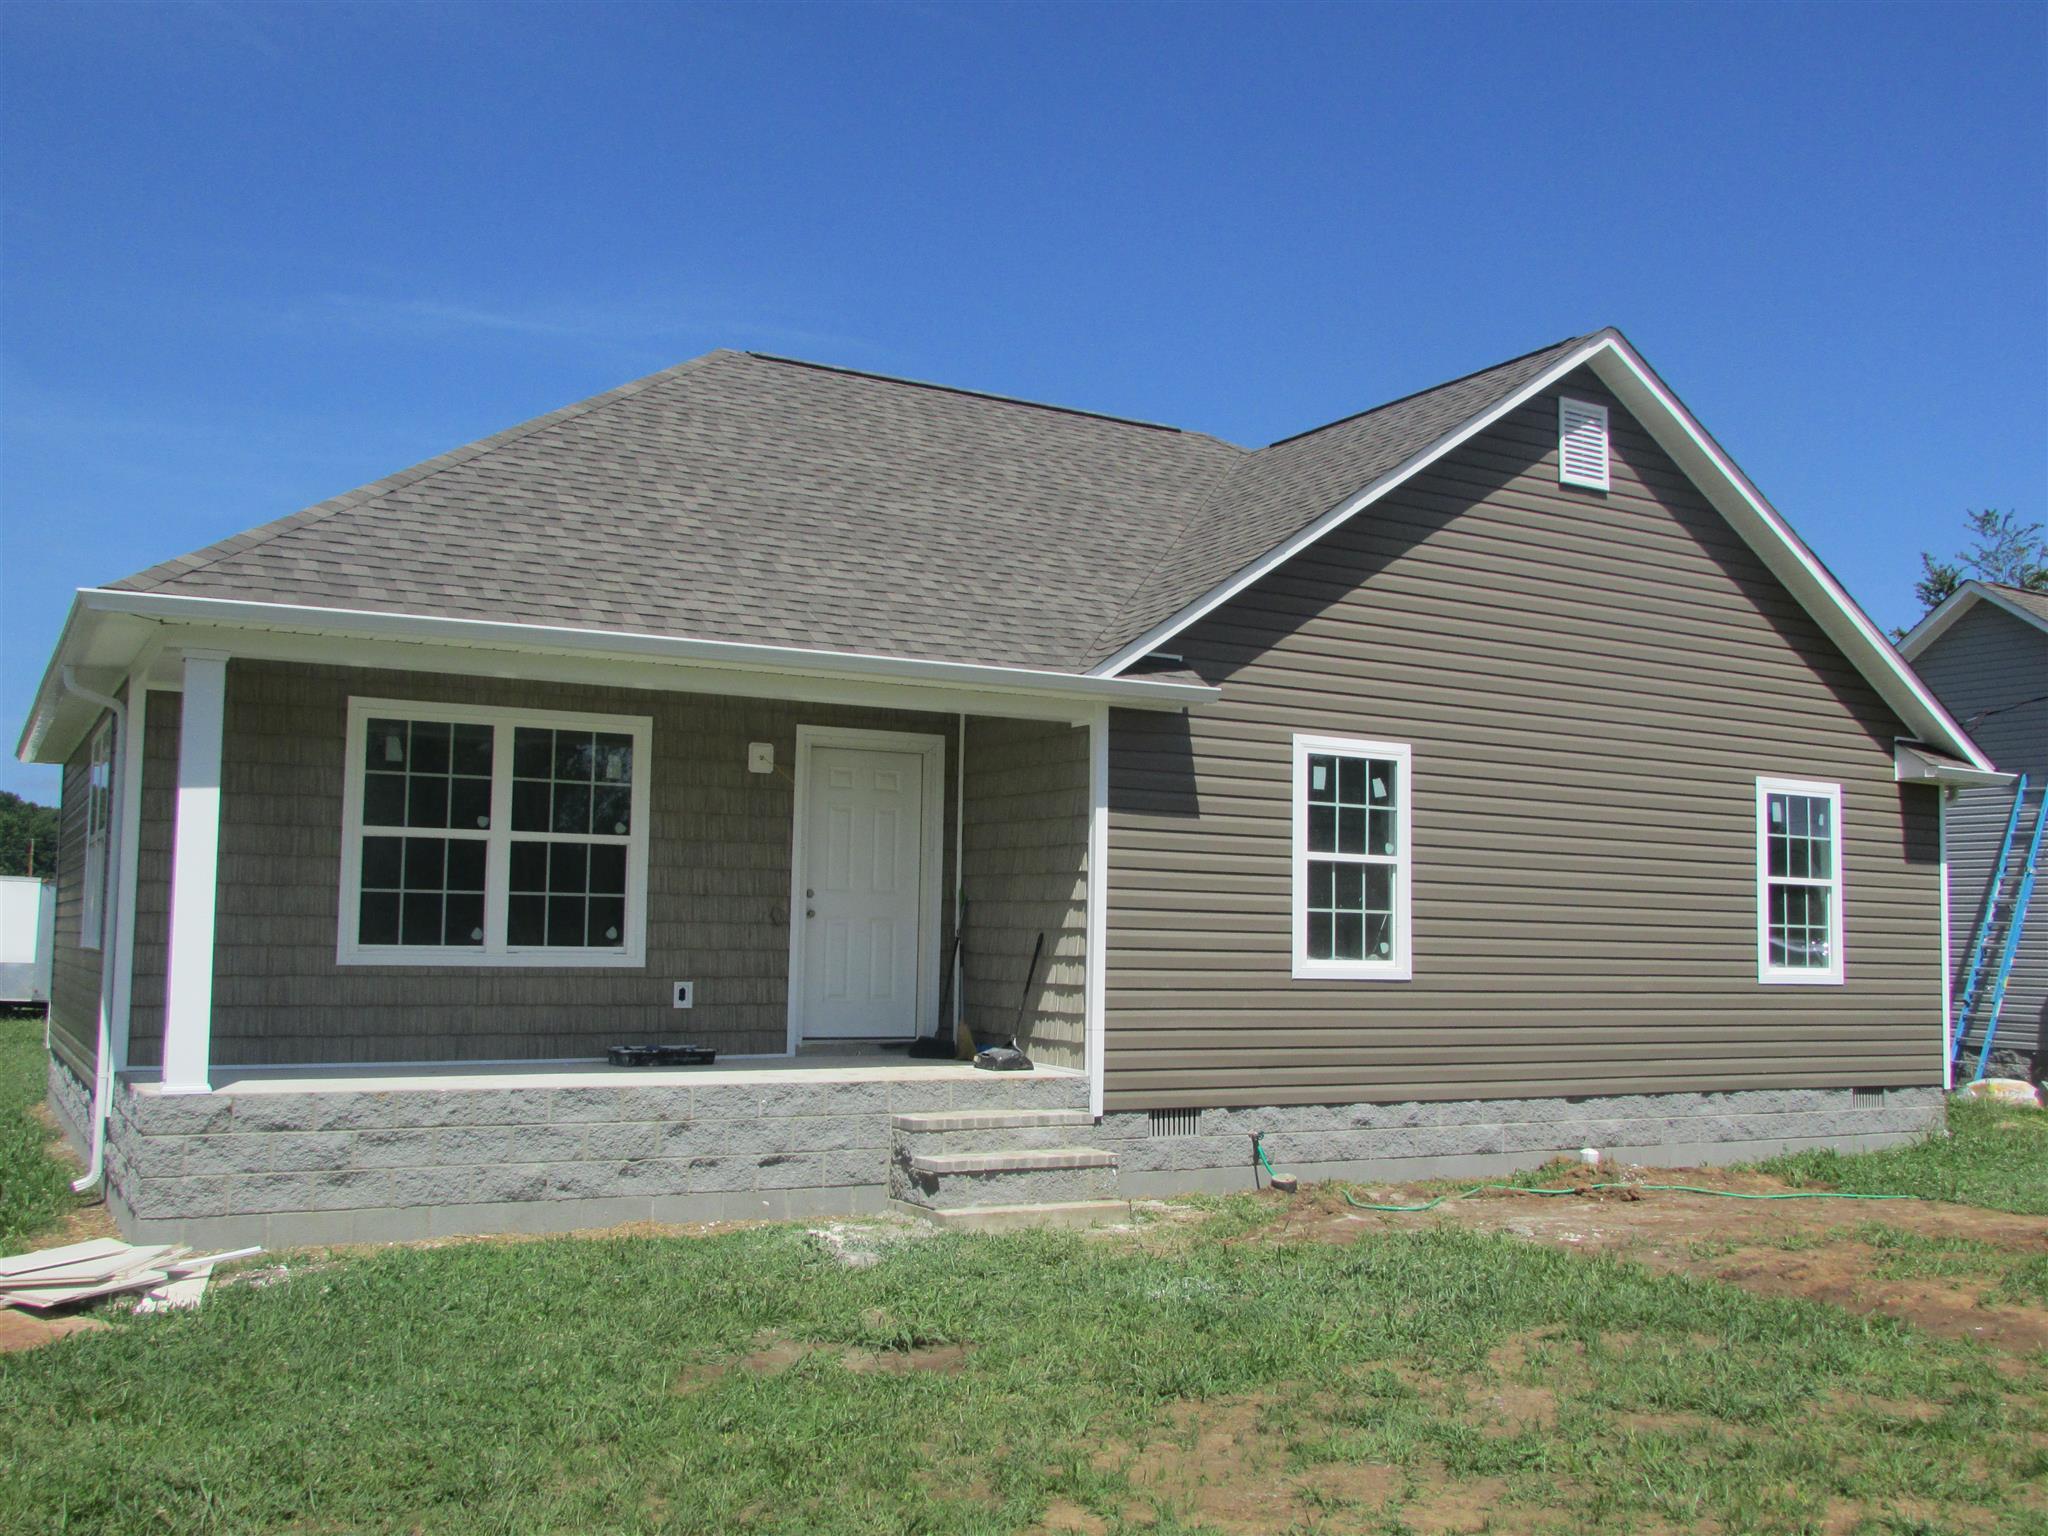 416 Gobble Street, Lawrenceburg, TN 38464 - Lawrenceburg, TN real estate listing